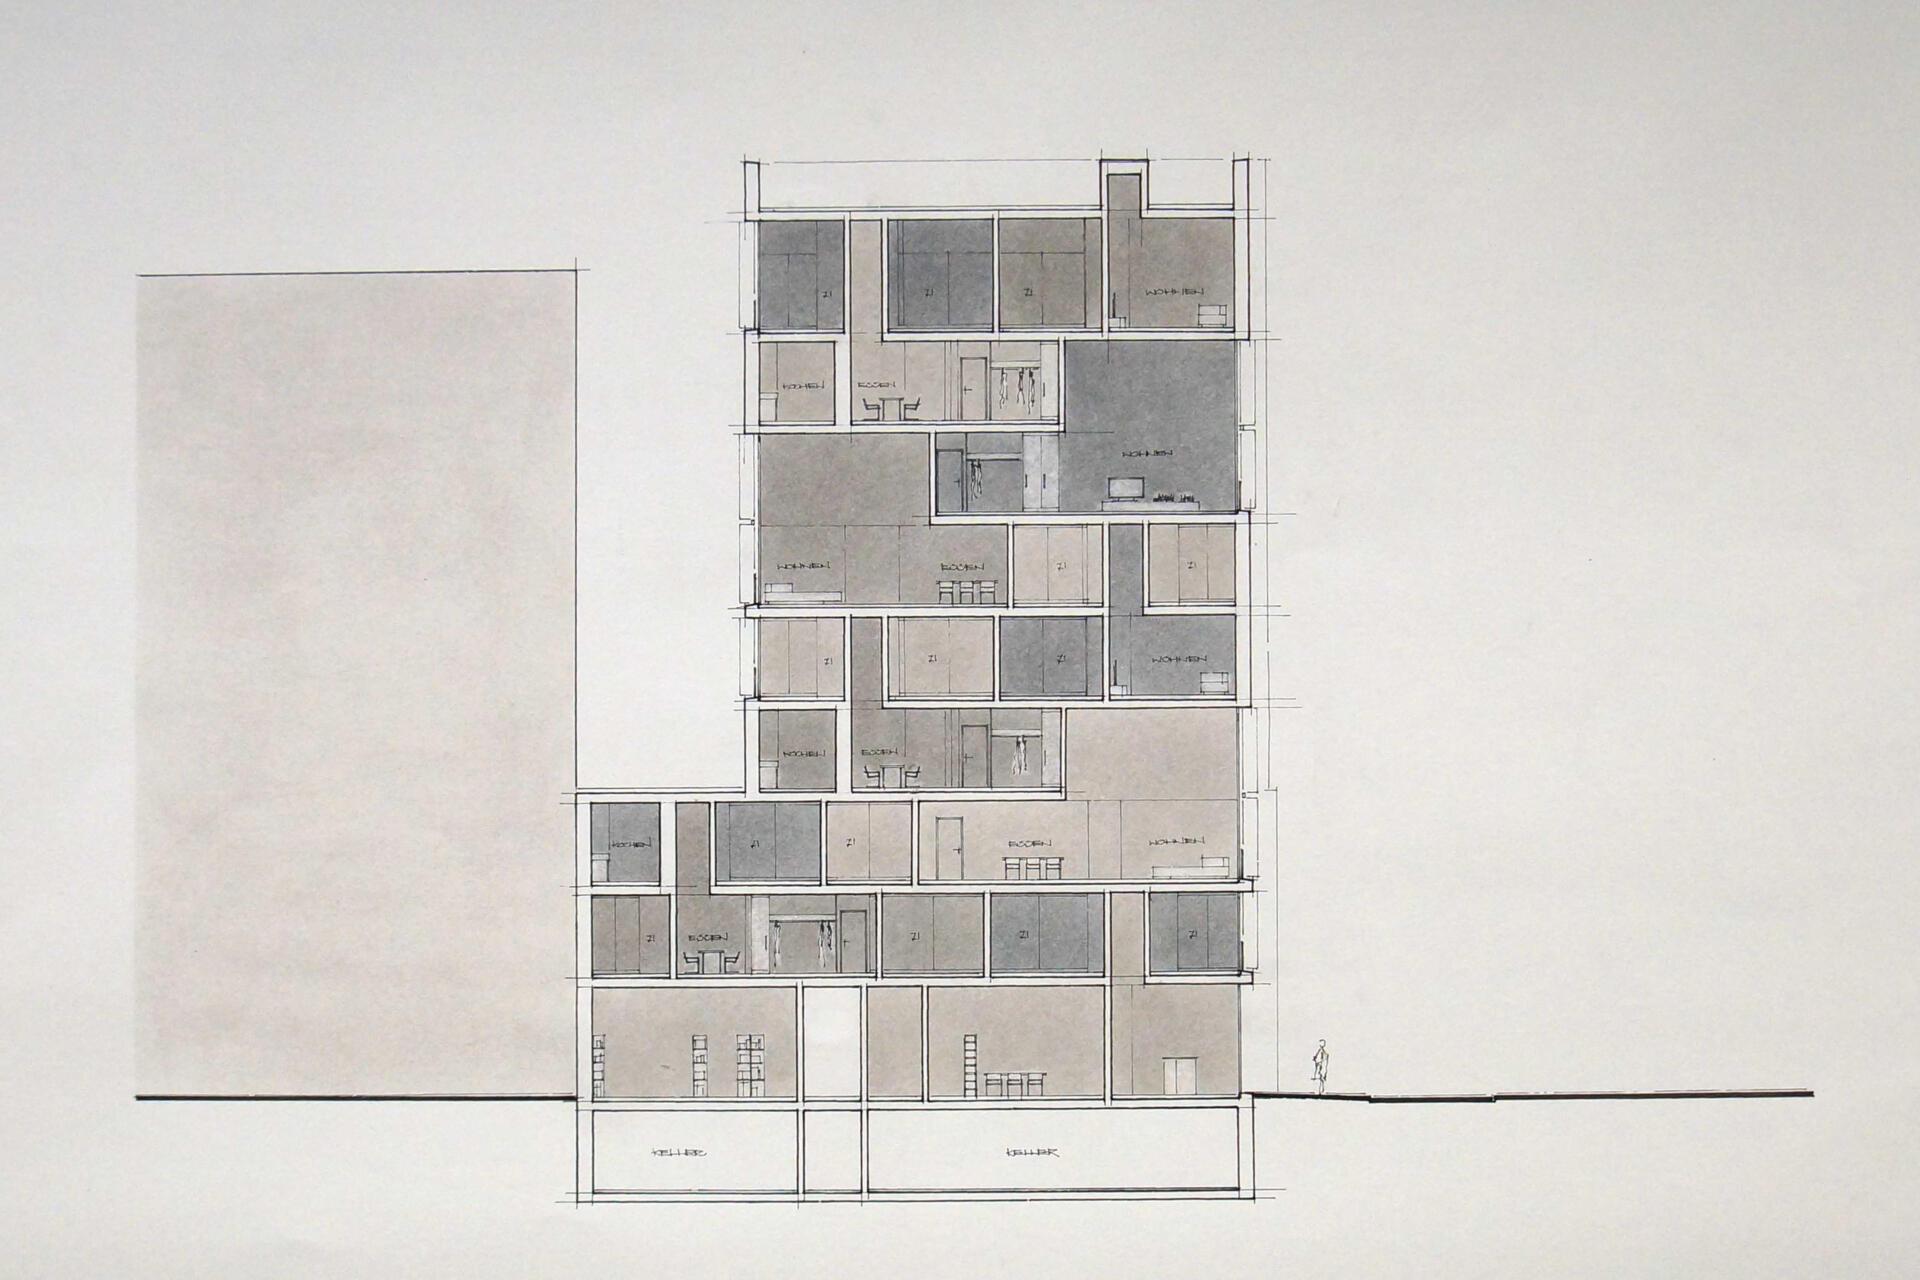 Wohnhaus 5